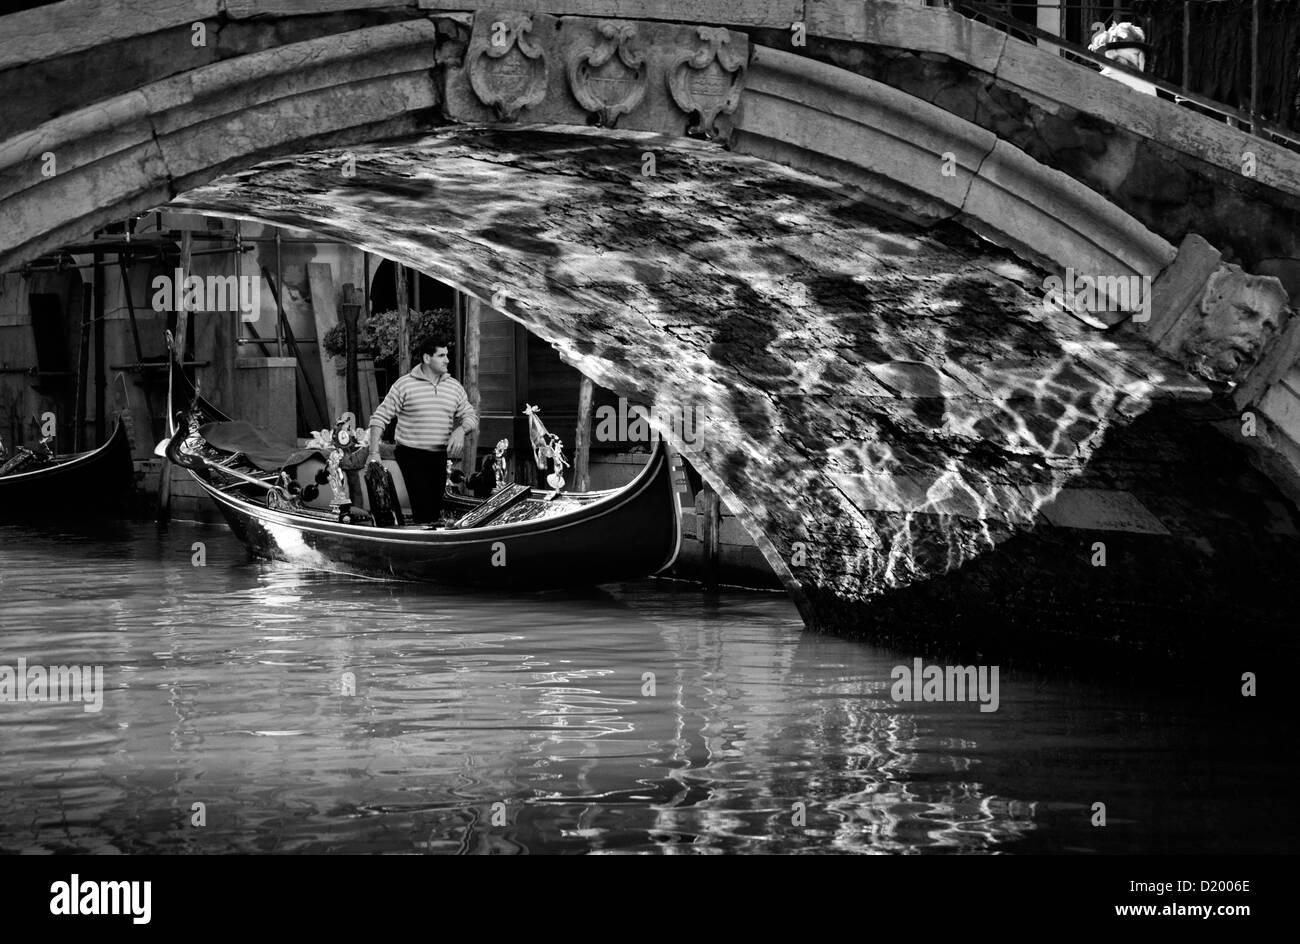 Gondola with Gondolier under the bridge, reflections of light, Venice, Italy - Stock Image